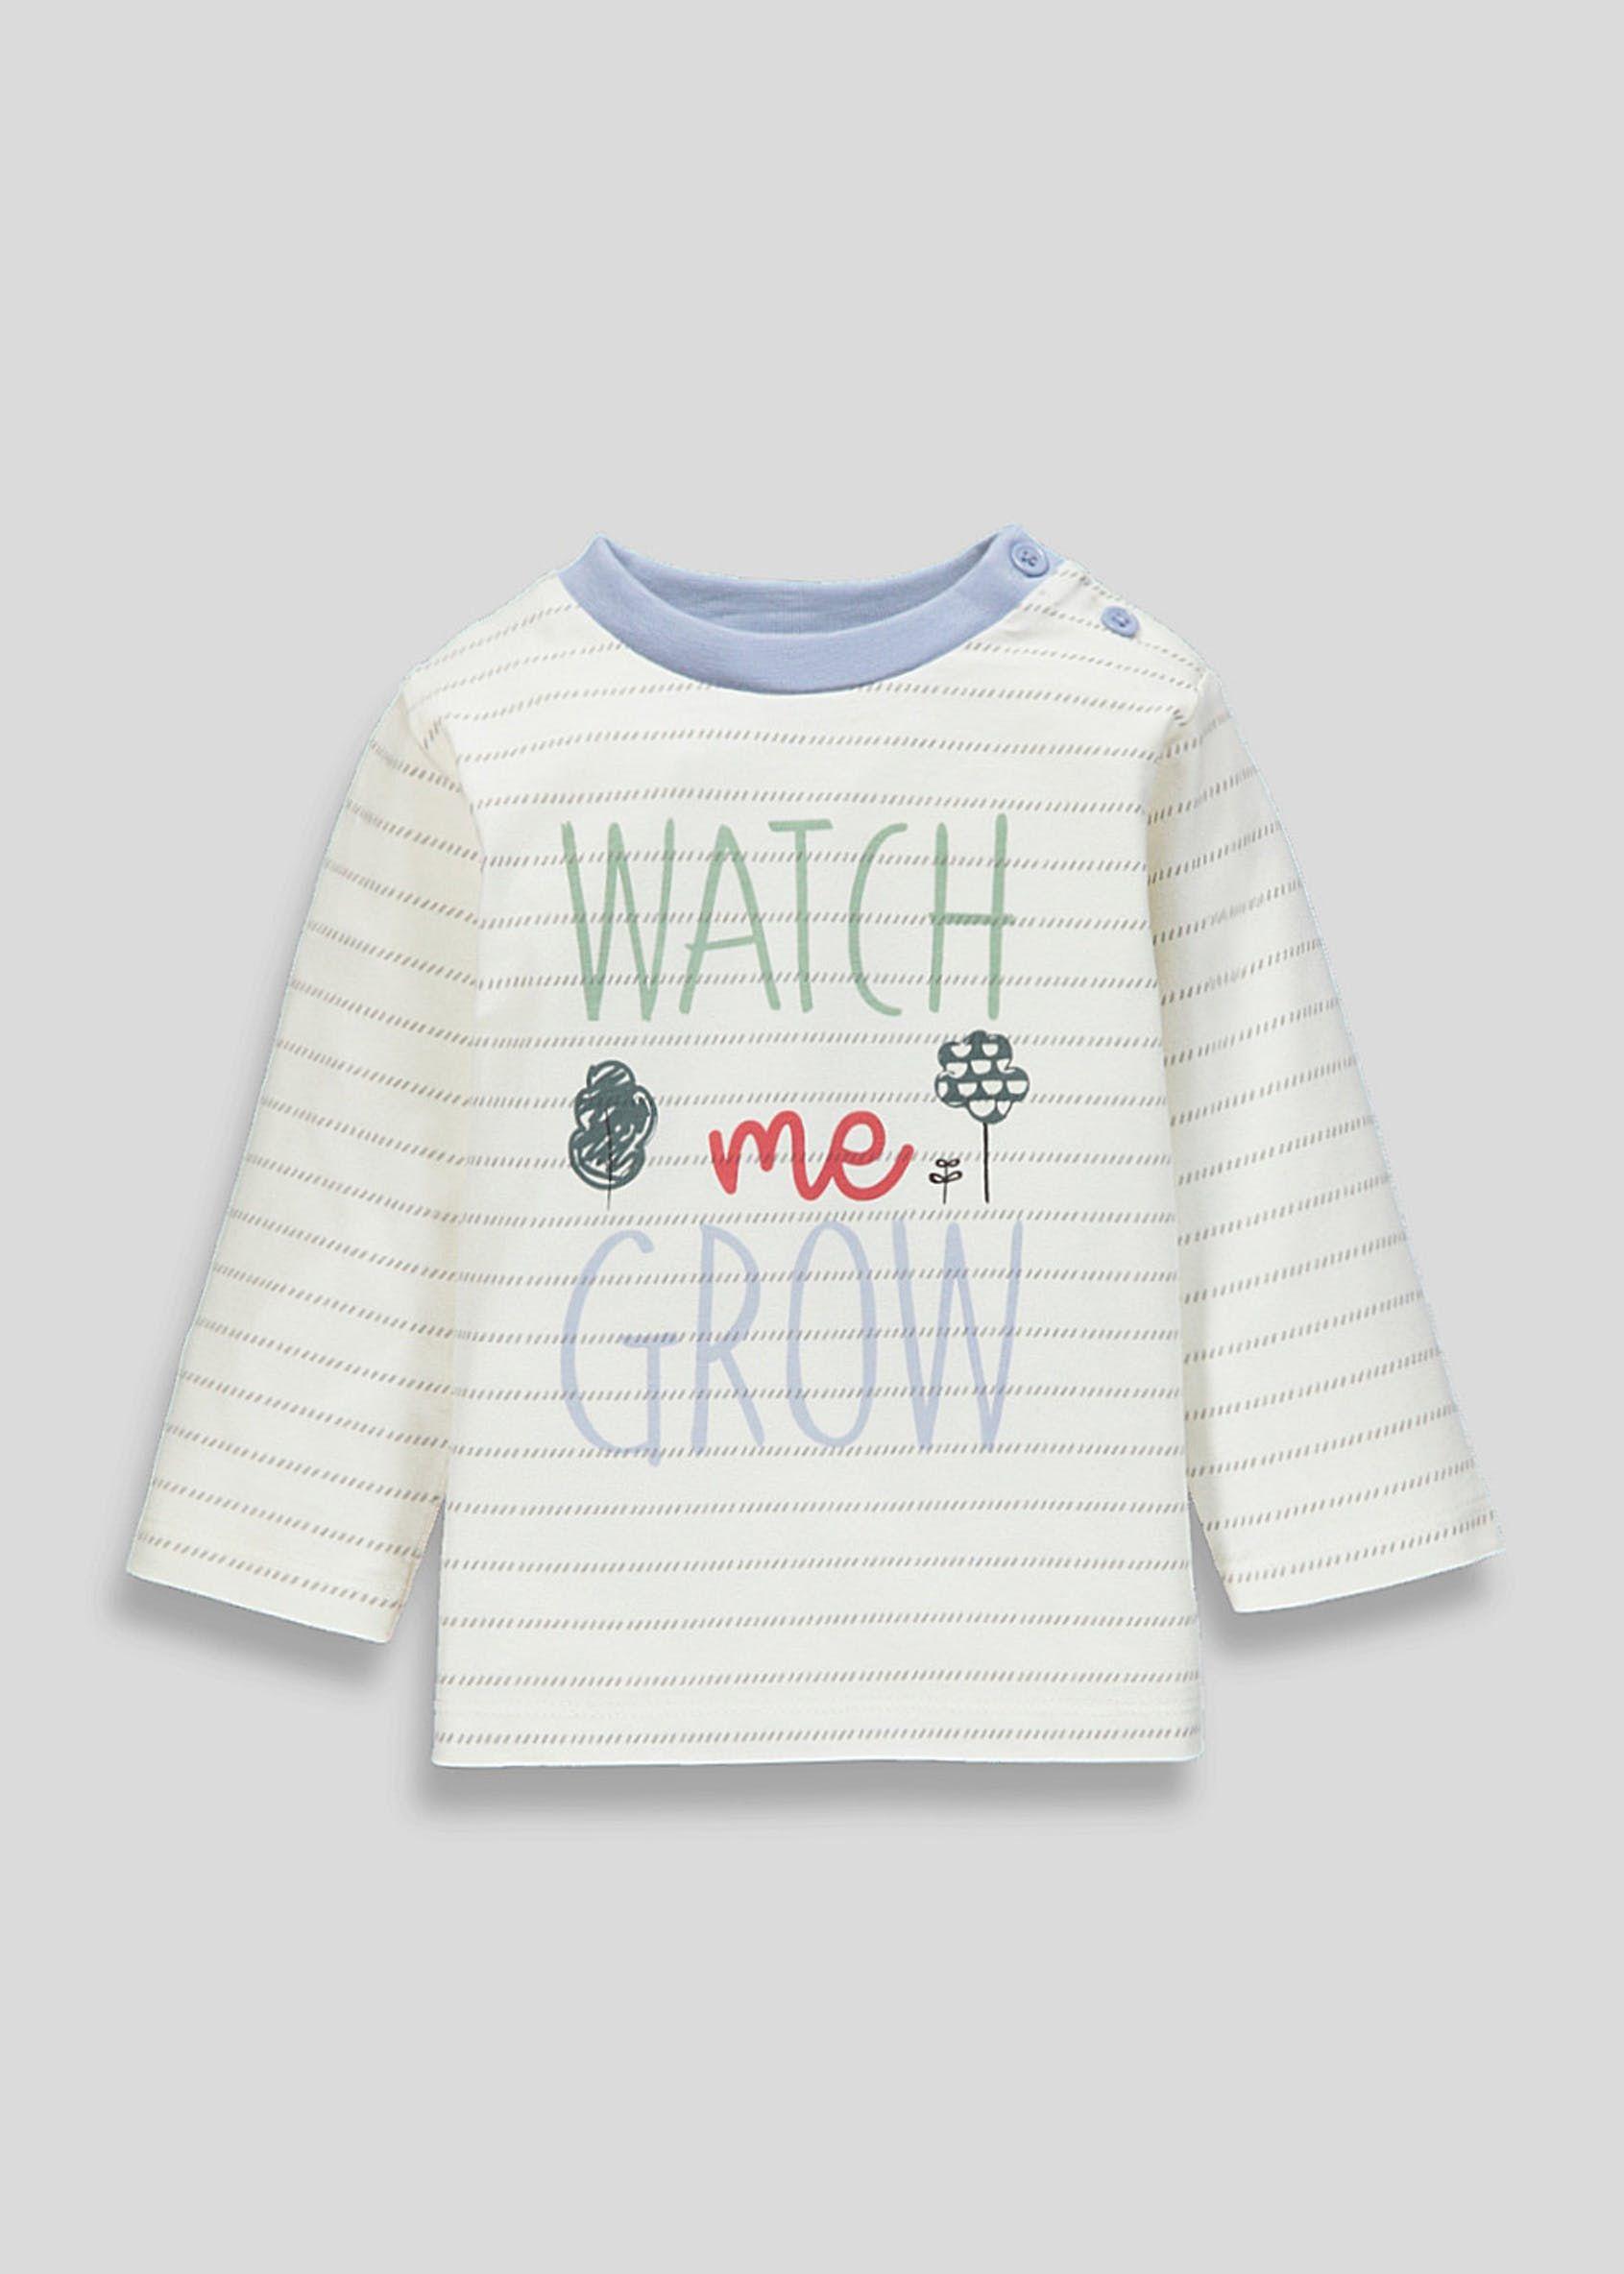 80c4327758bb1 Unisex Grow Slogan T-Shirt (Newborn-18mths) – Green | Baby/older ...